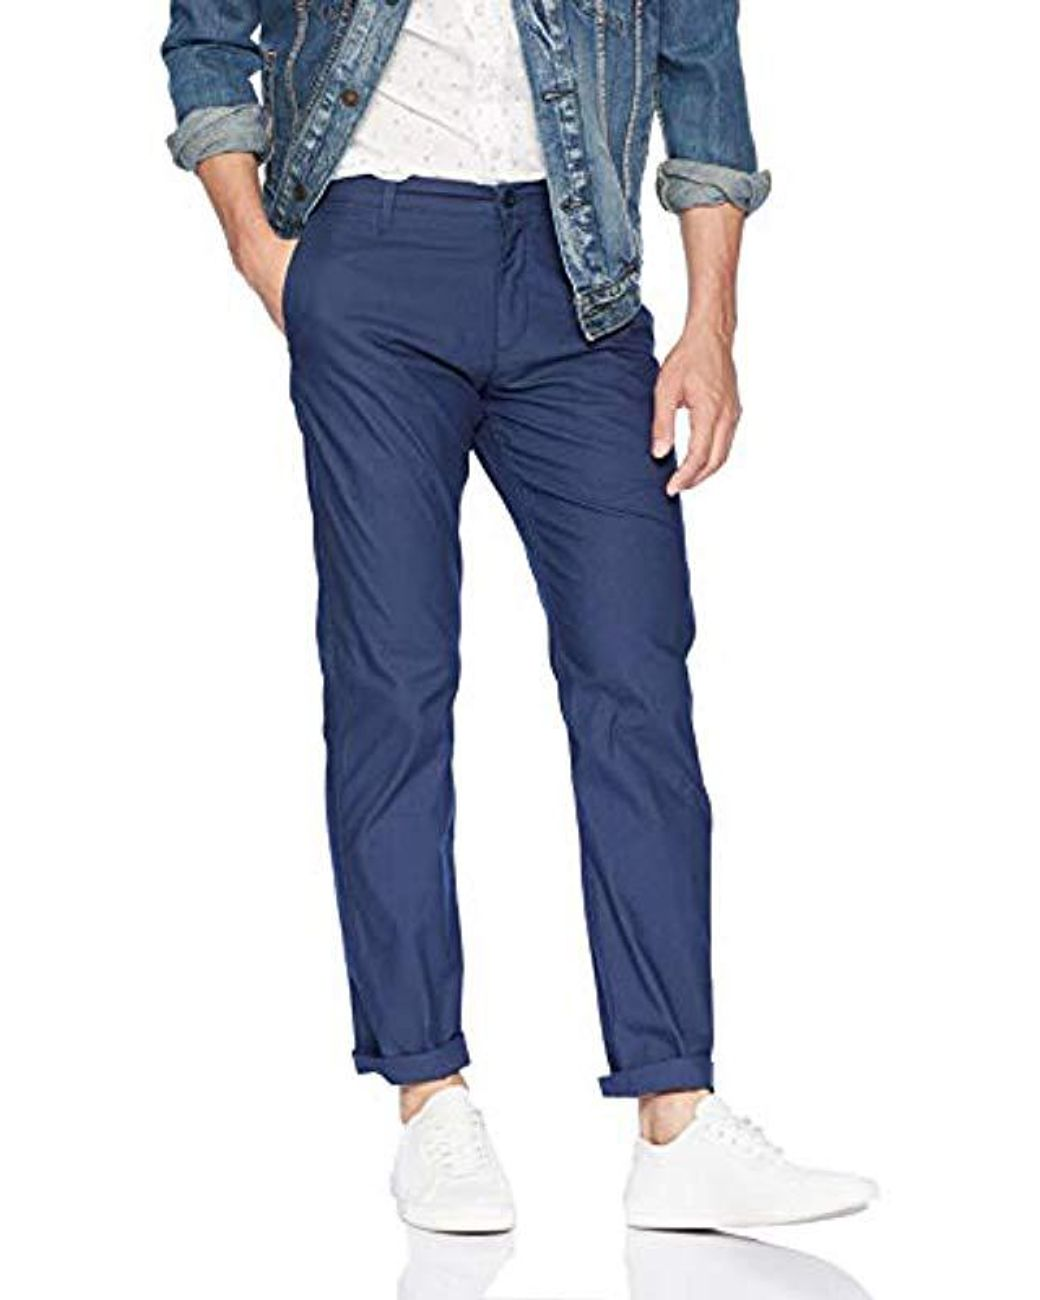 Dockers Men/'s Blue Textured The Broken In Alpha Khaki Slim Tapered Fit Pants